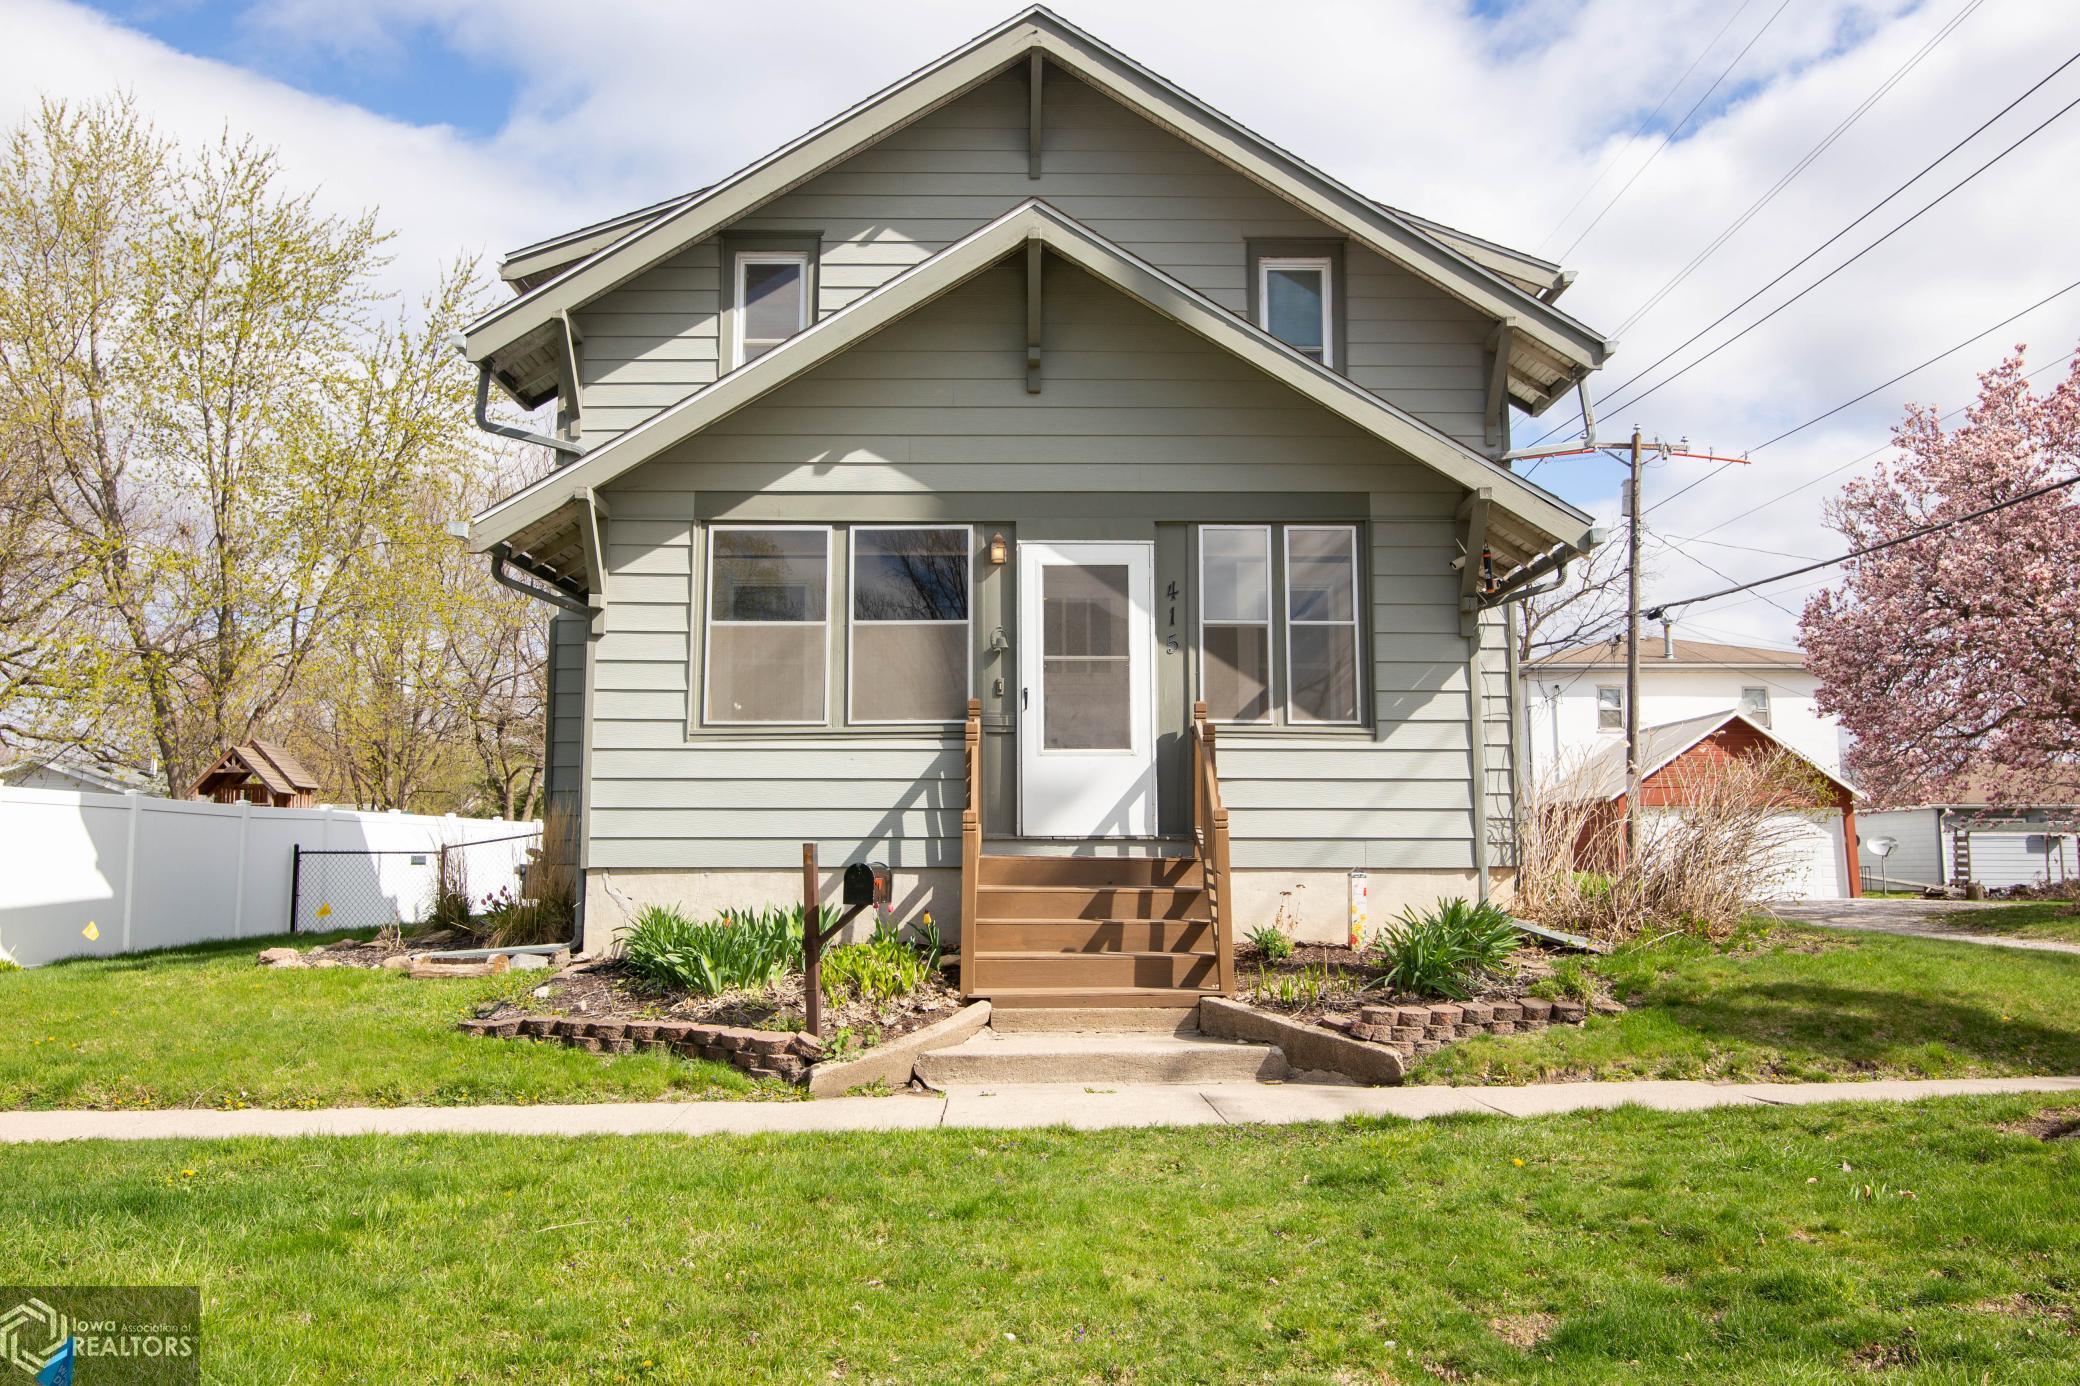 415 J, Nevada, Iowa 50201-1839, 3 Bedrooms Bedrooms, ,1 BathroomBathrooms,Single Family,For Sale,J,5740456